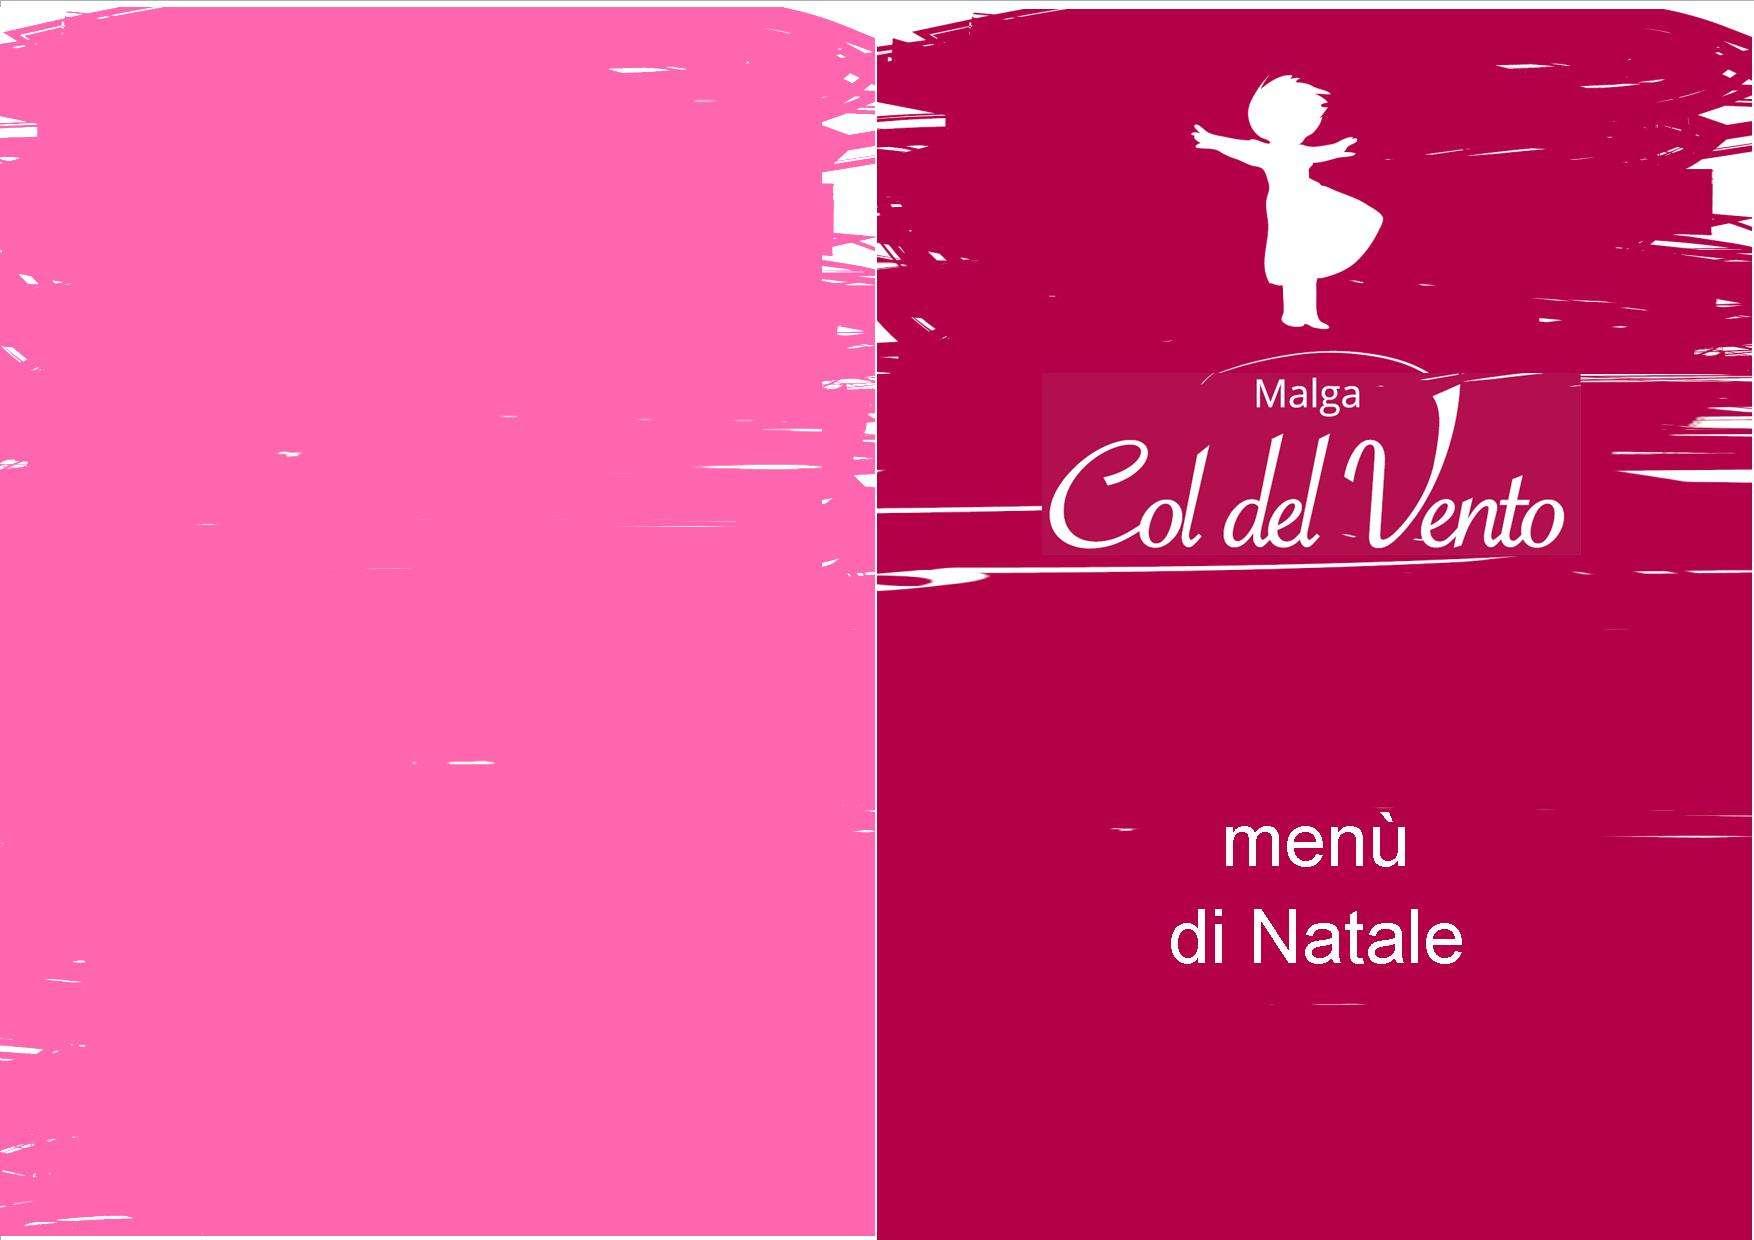 menu-di-natale-1